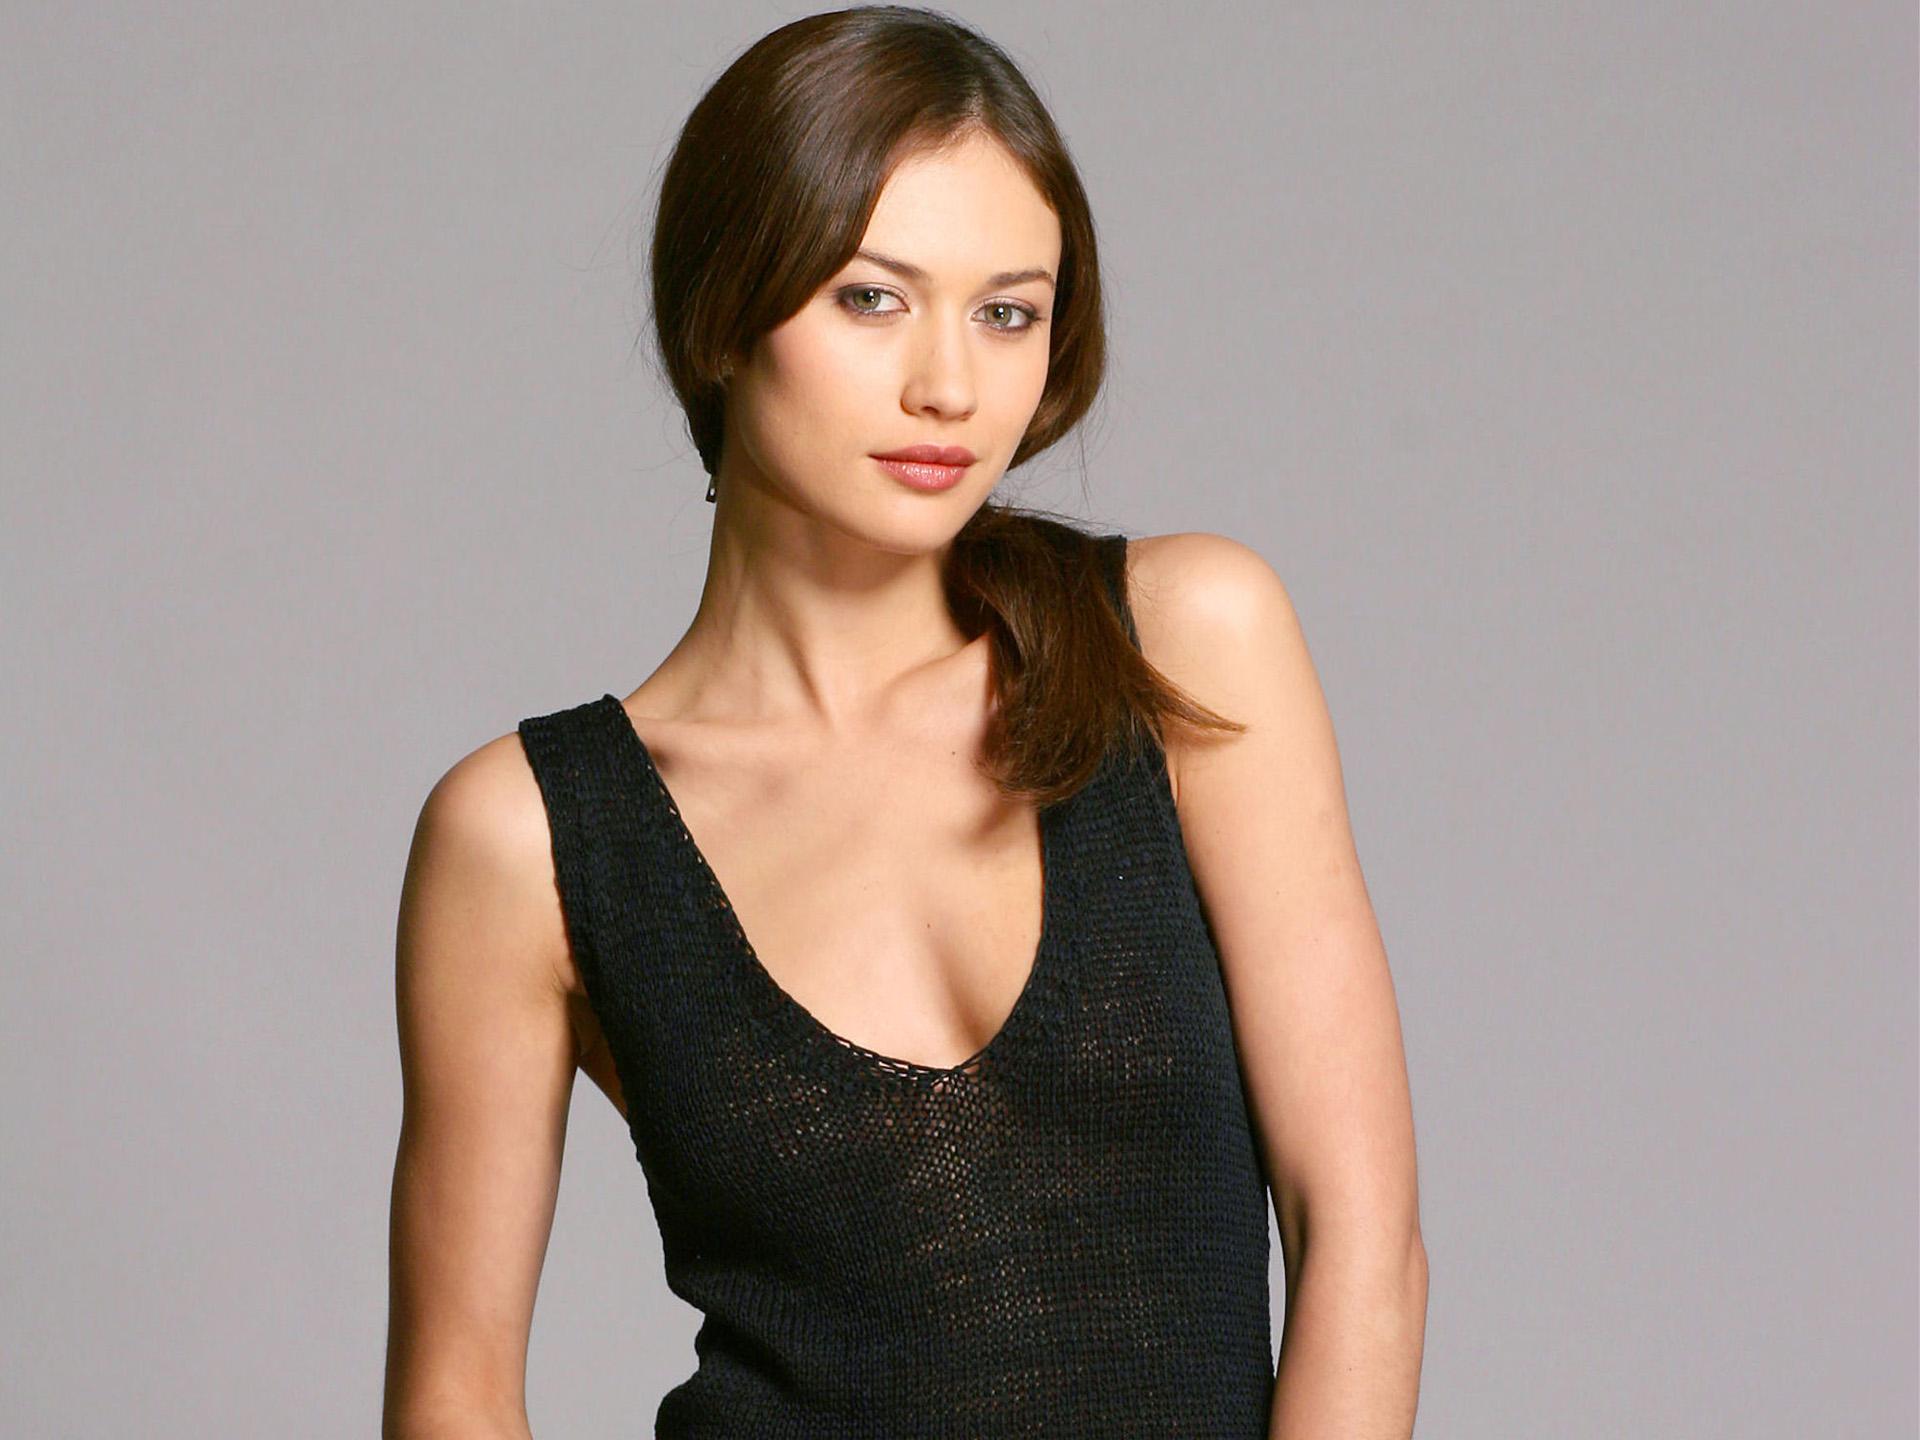 Bond Girl Olga Kurylenko HD Wallpapers  HD Wallpapers